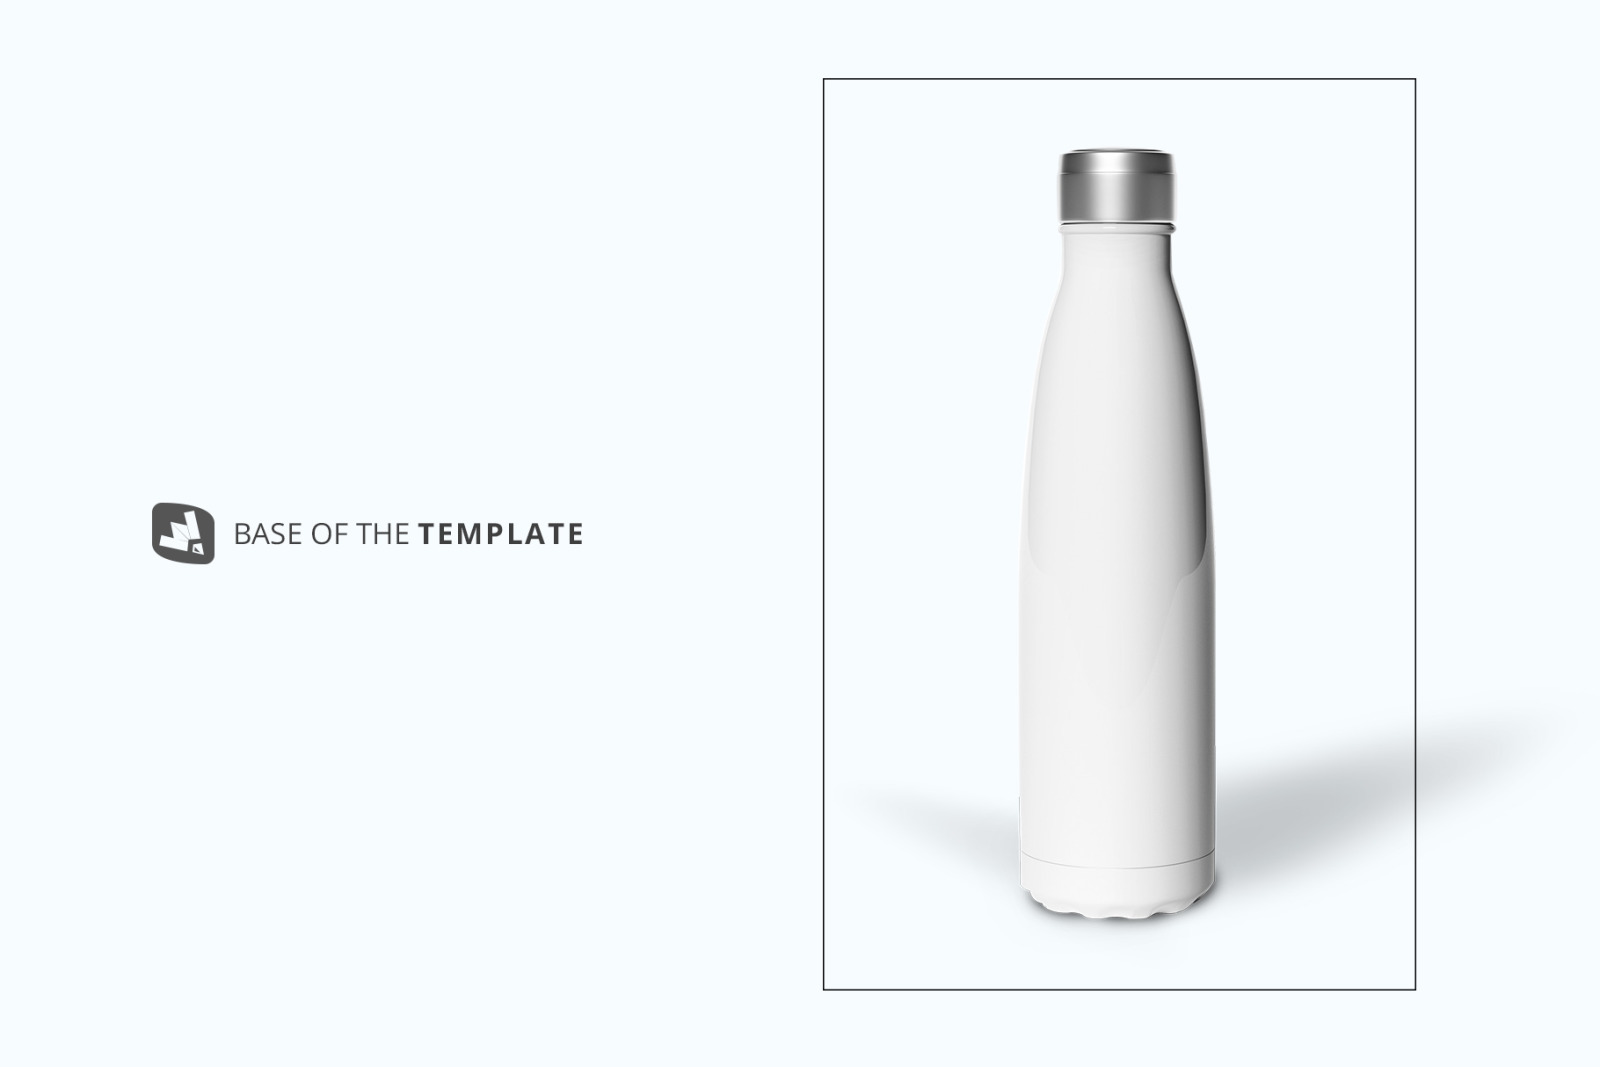 Steel Thermos Bottle Mockup